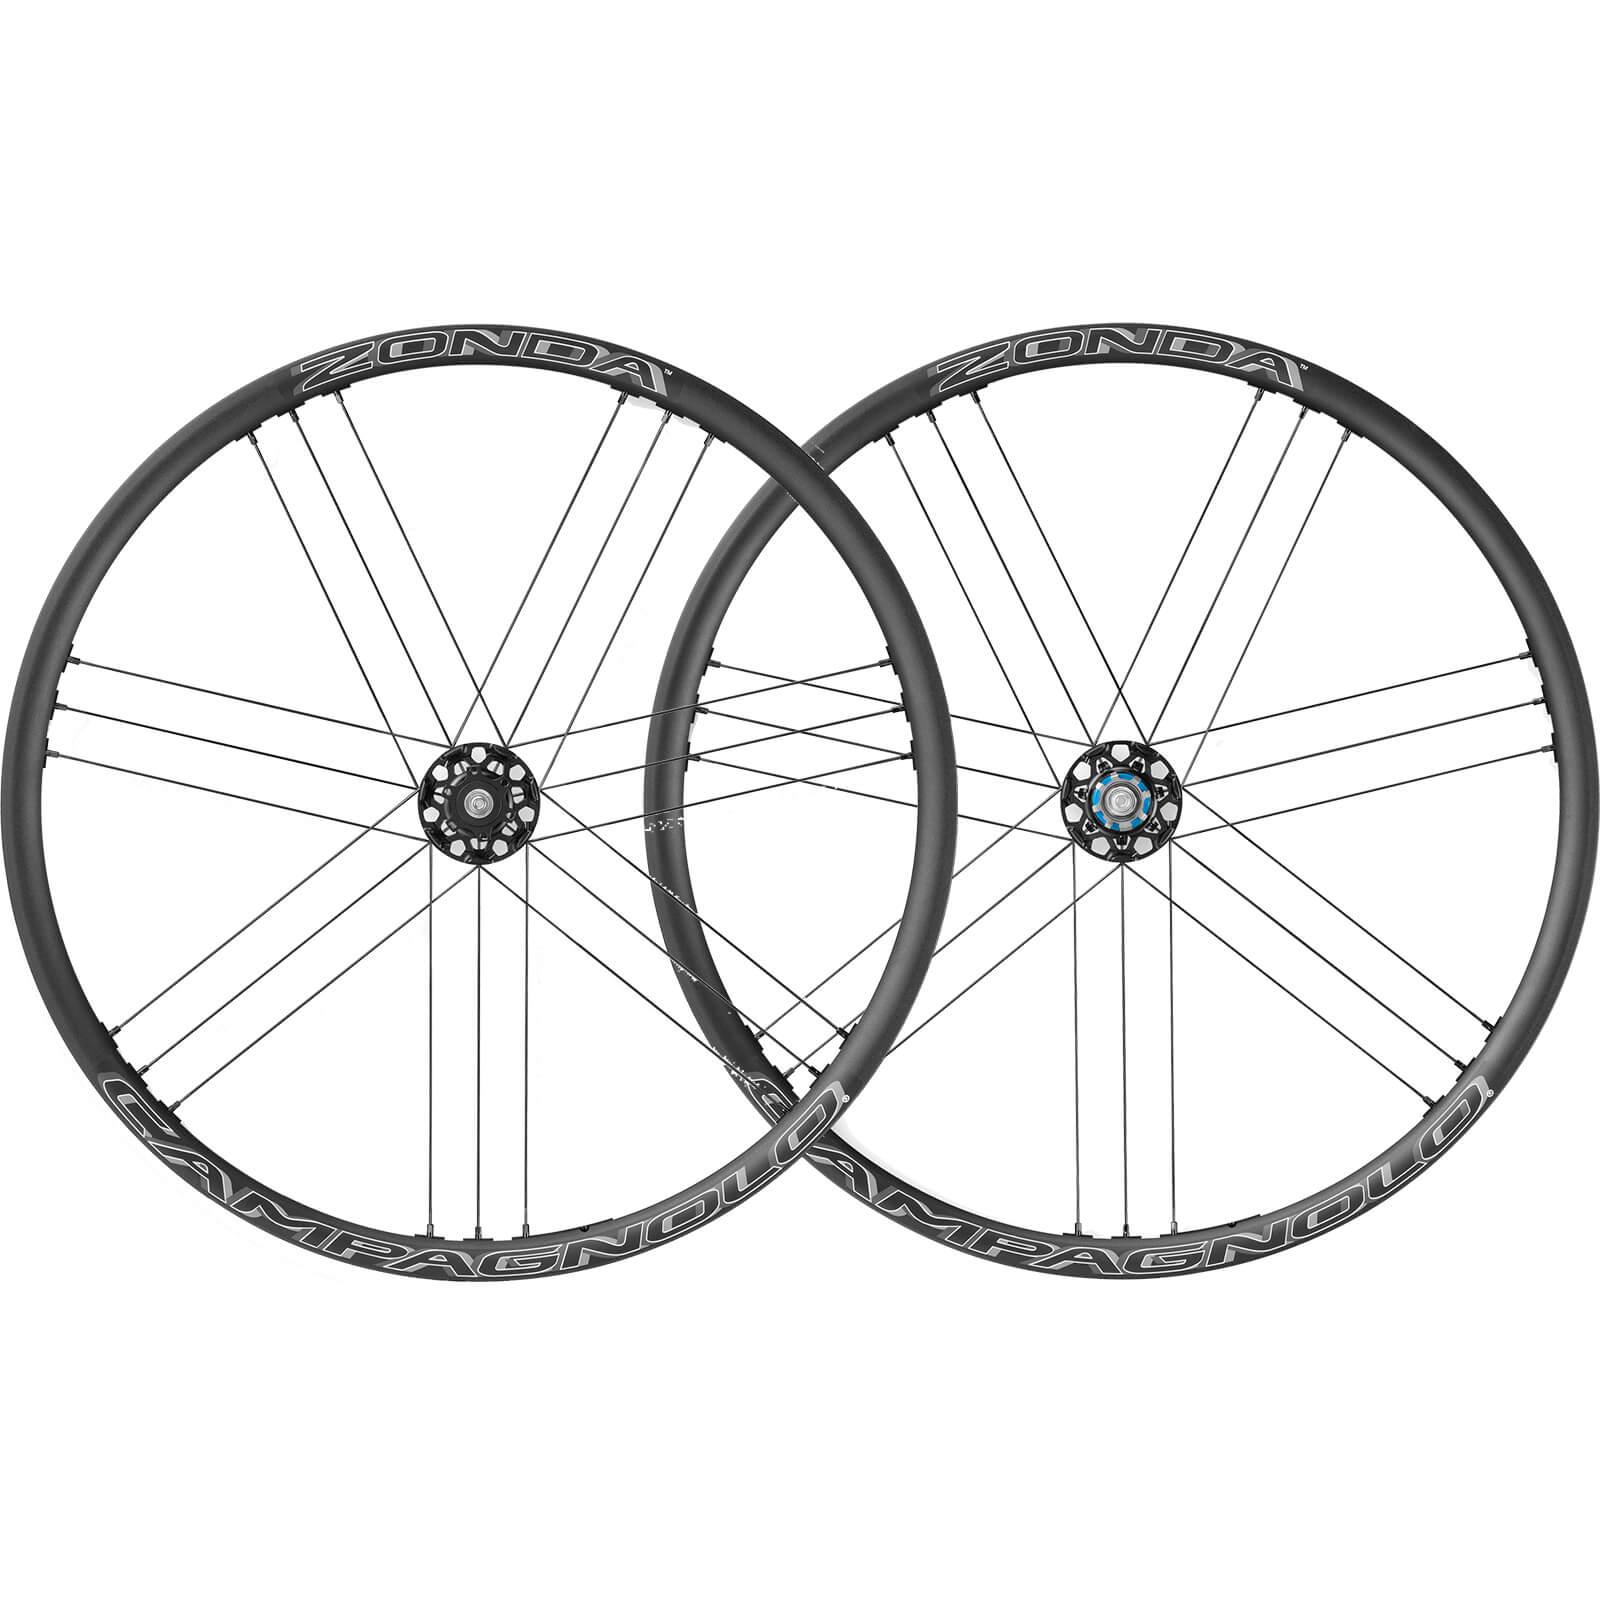 Campagnolo Zonda C17 Disc Brake Bolt-Thru Clincher Wheelset 2018 - Black - AFS Rotor - Campagnolo - Dark Label